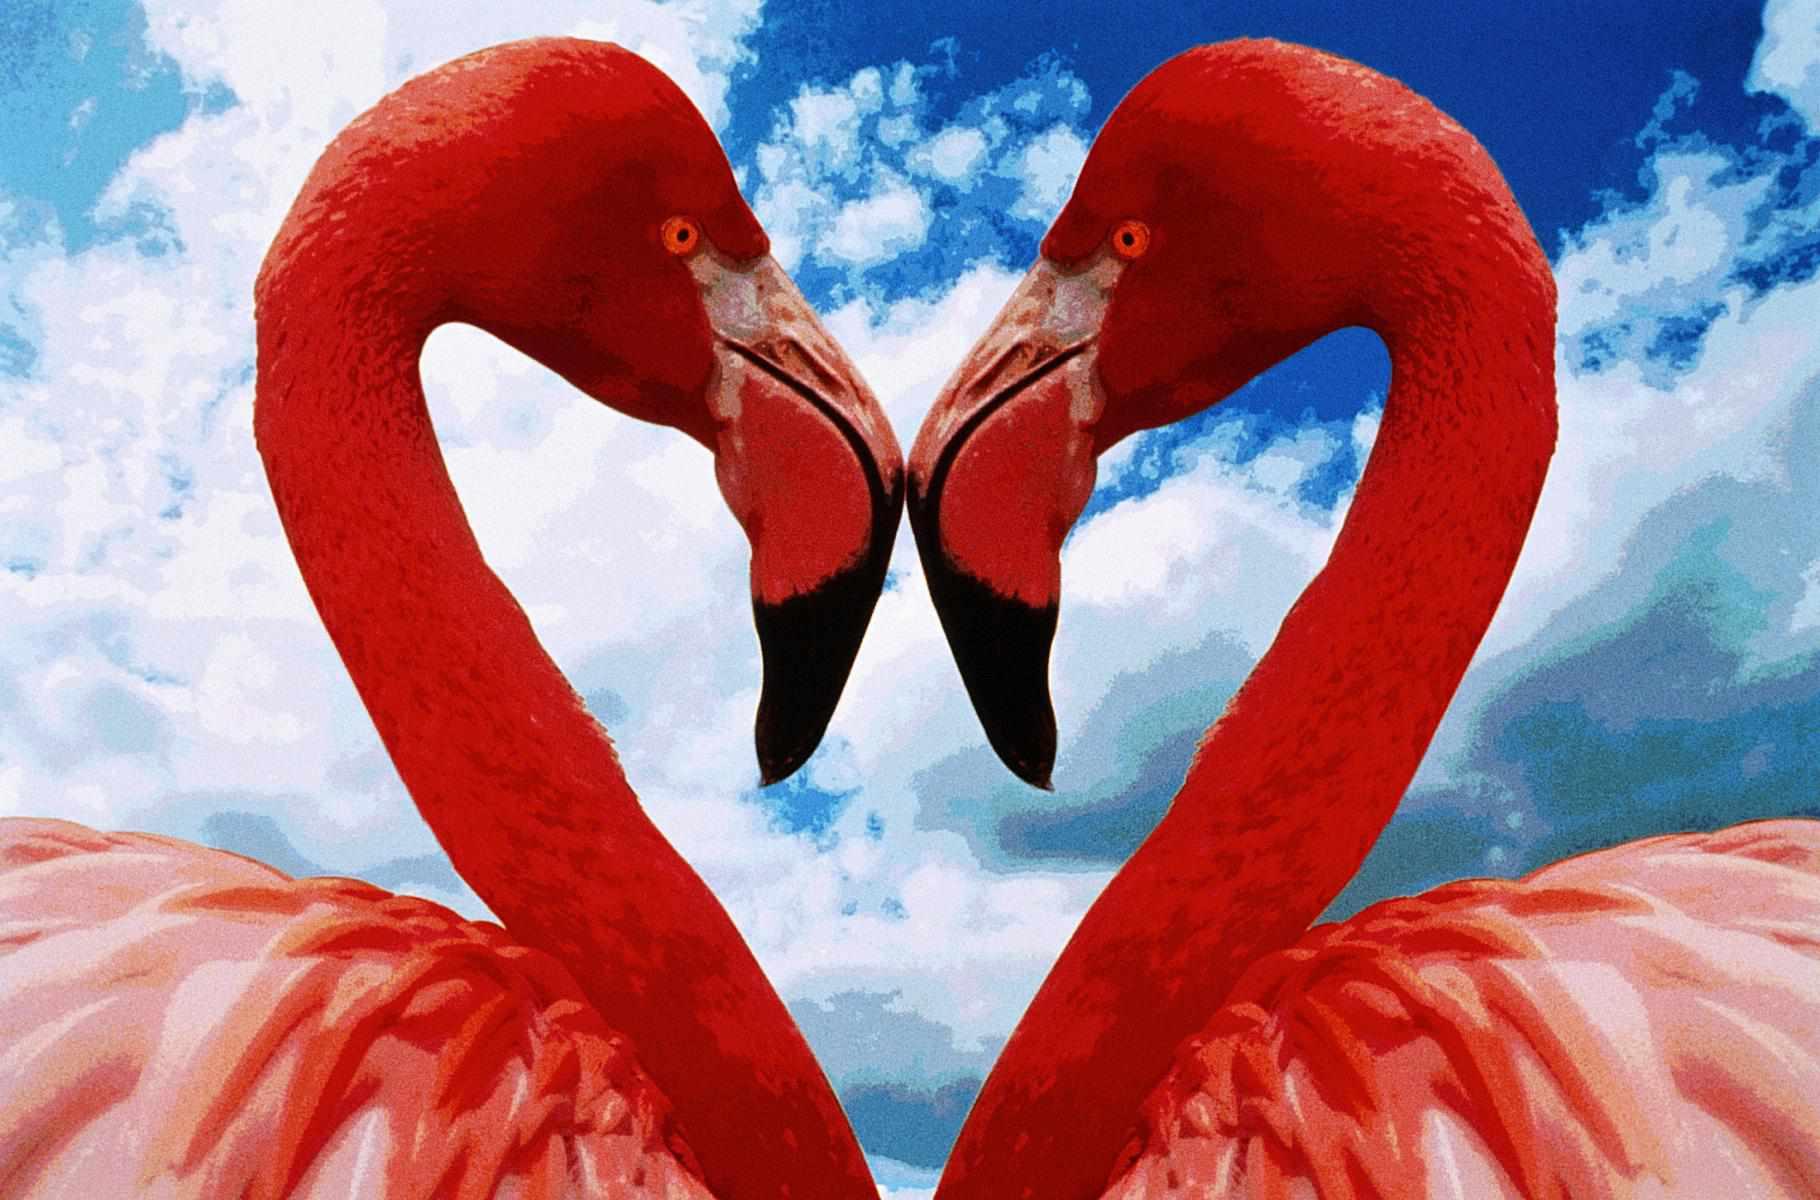 Two Flamingos beak to beak